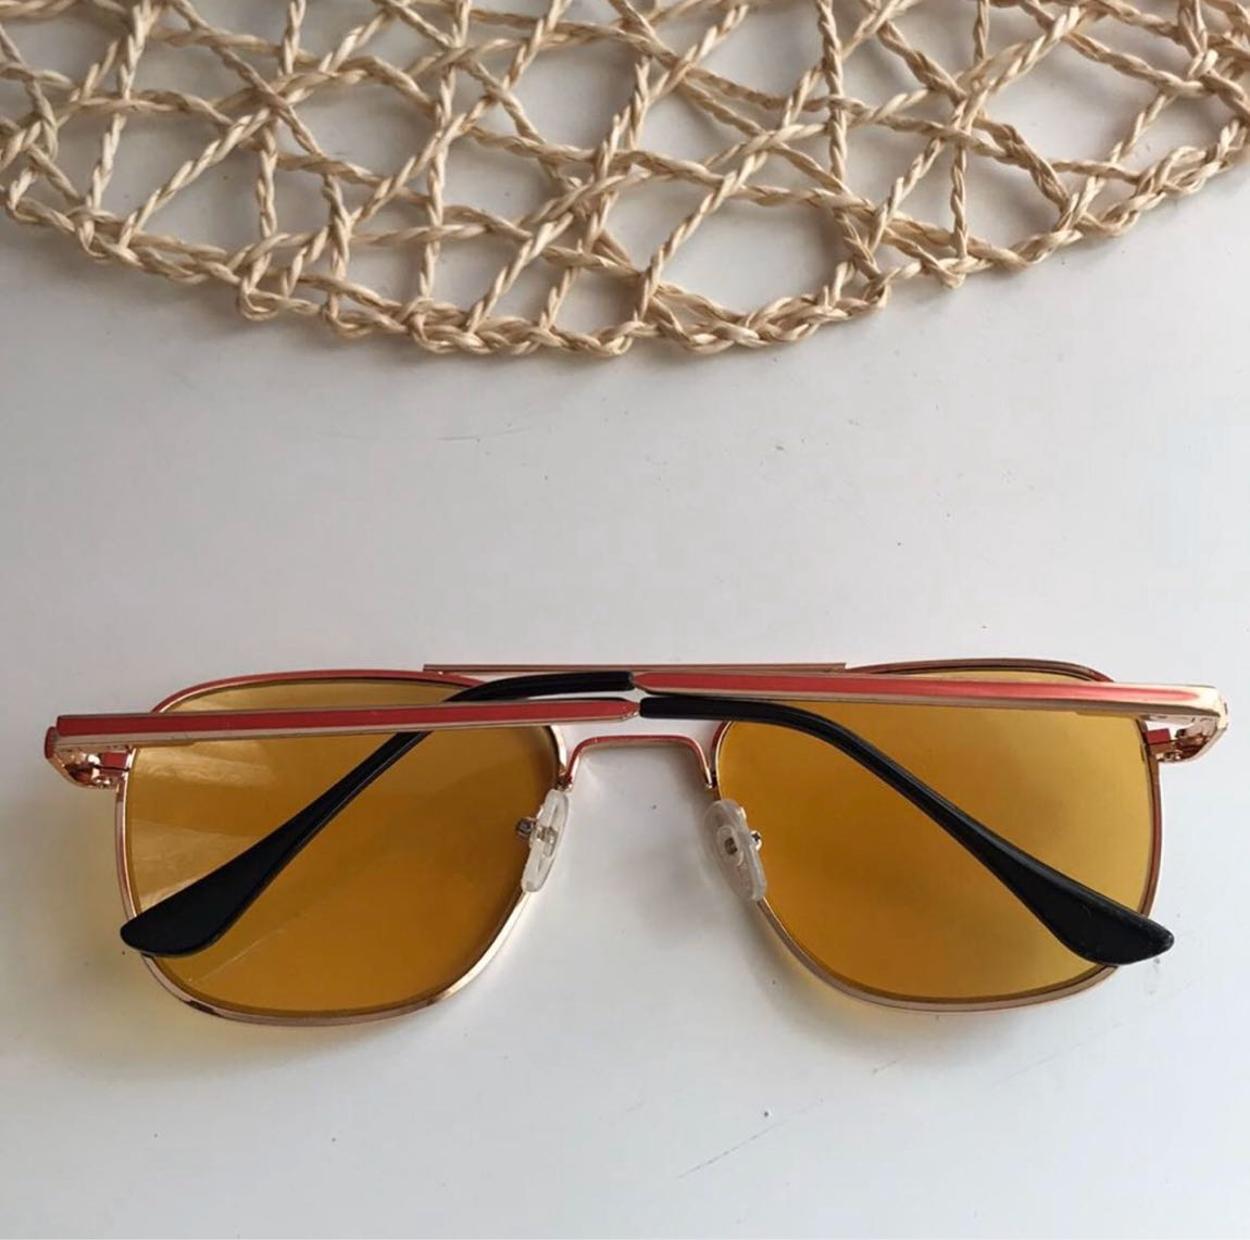 American Retro Gözlük